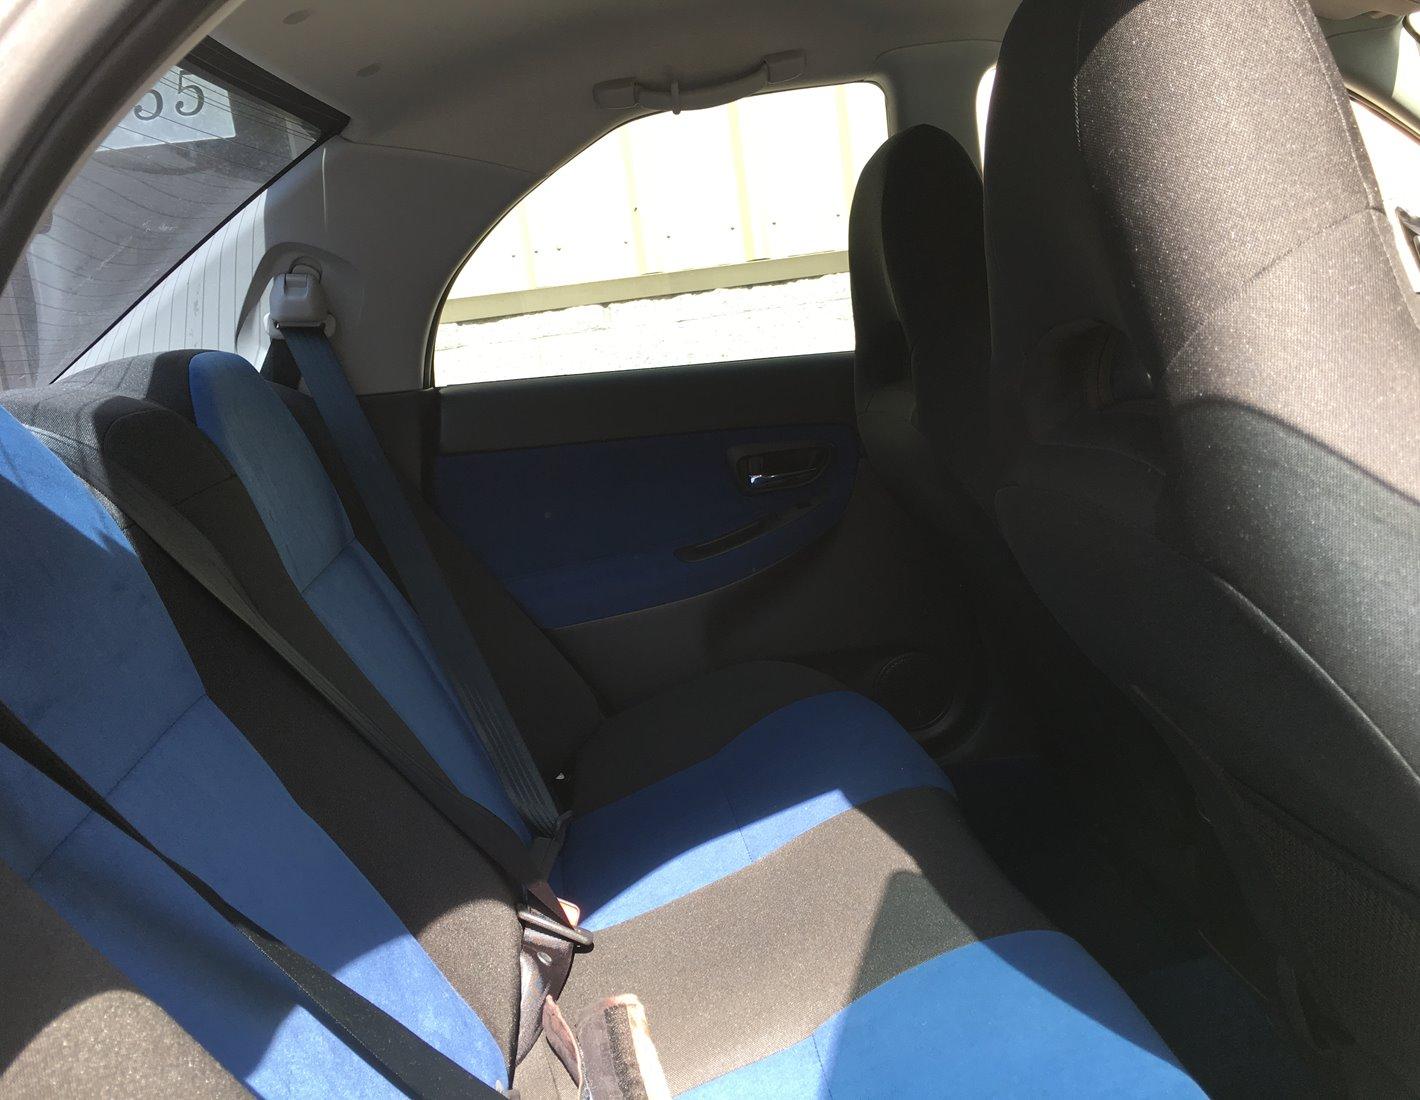 Premier Auto Visalia | Upcomingcarshq.com